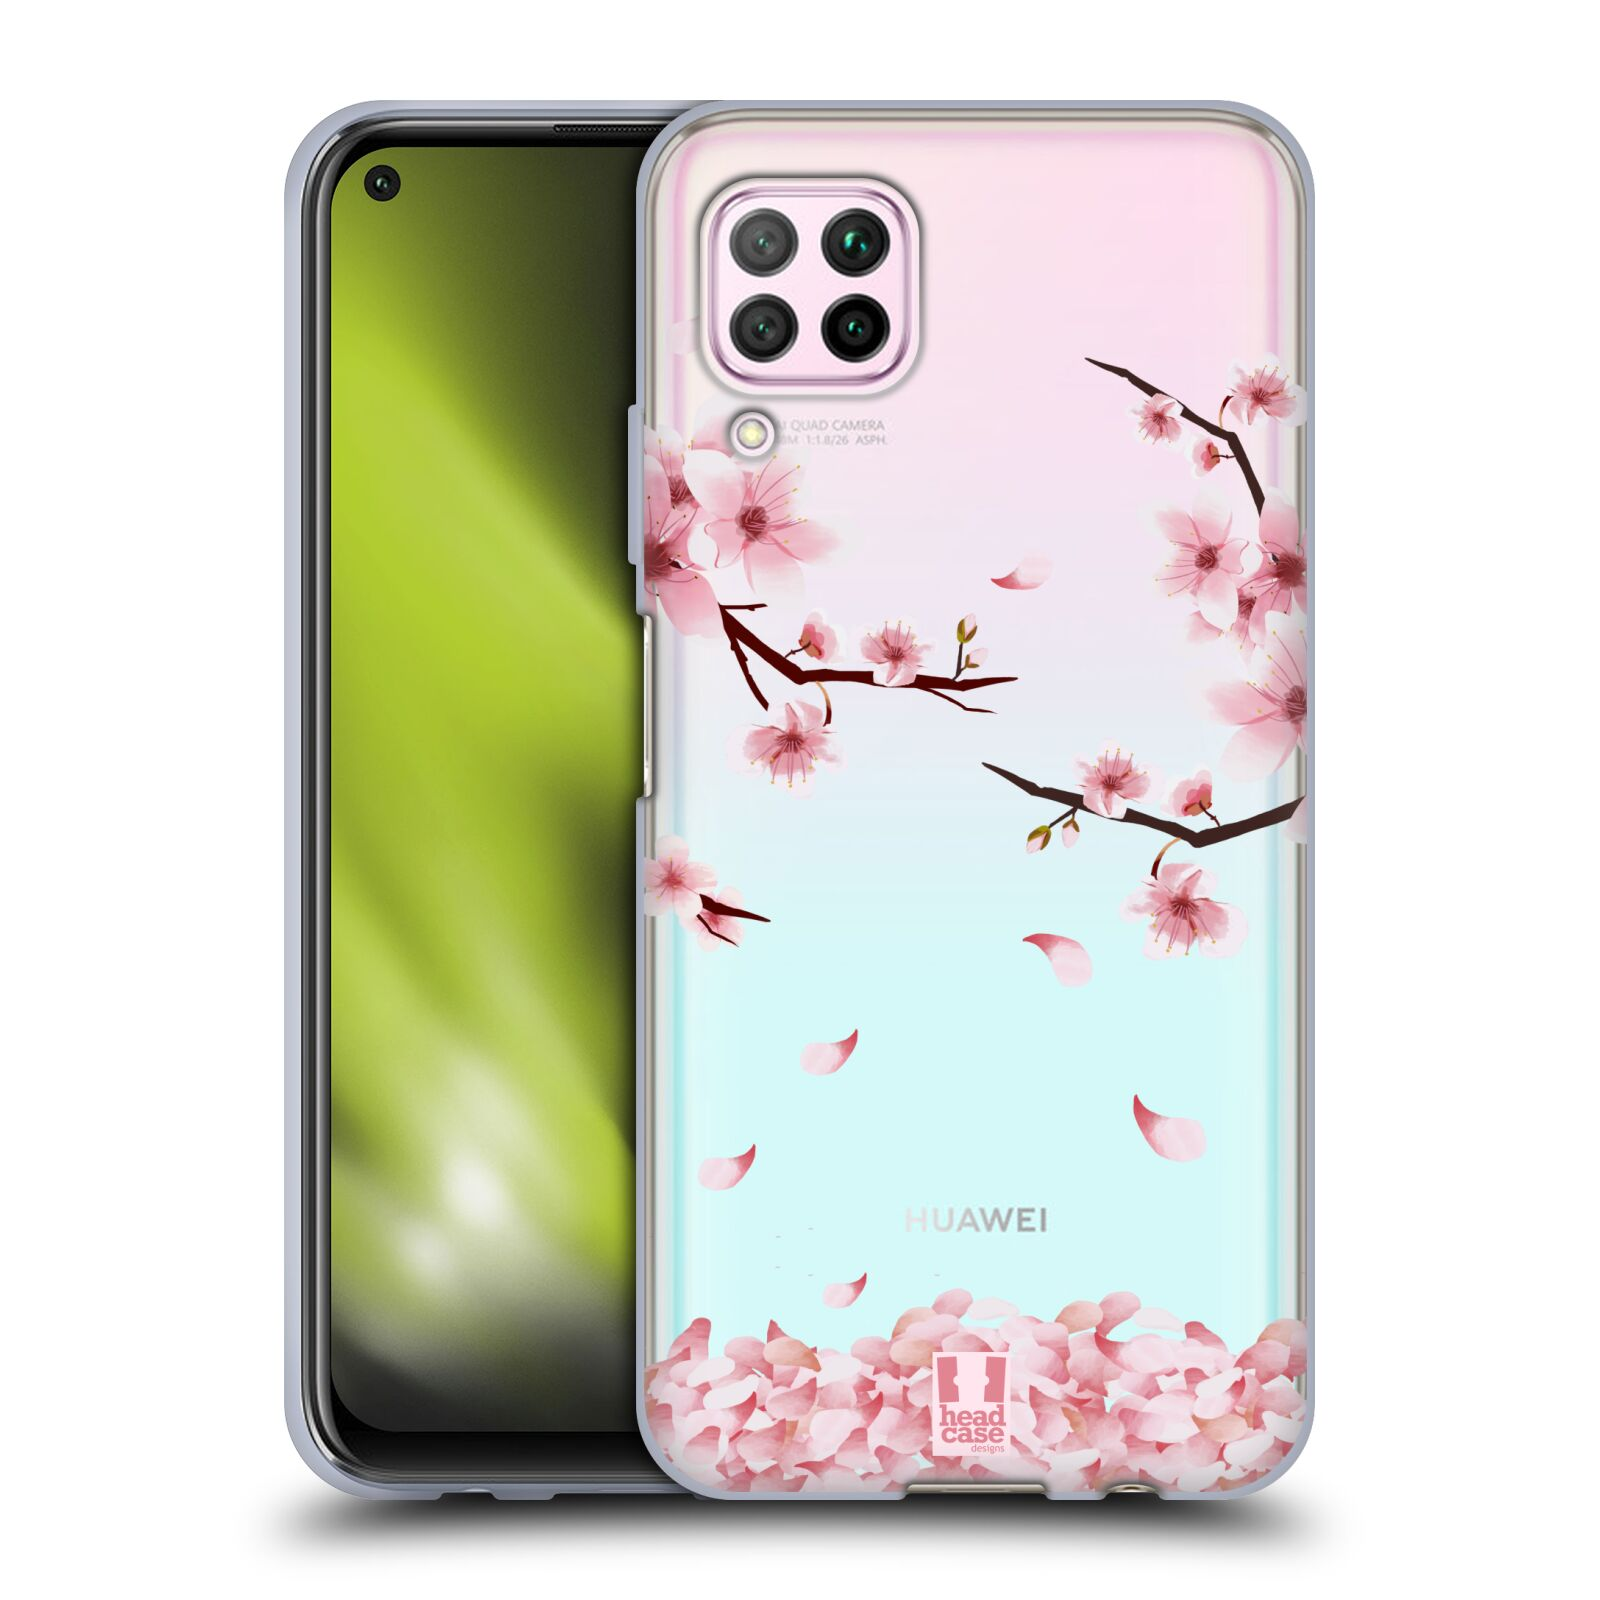 Silikonové pouzdro na mobil Huawei P40 Lite - Head Case - Květy a větvičky